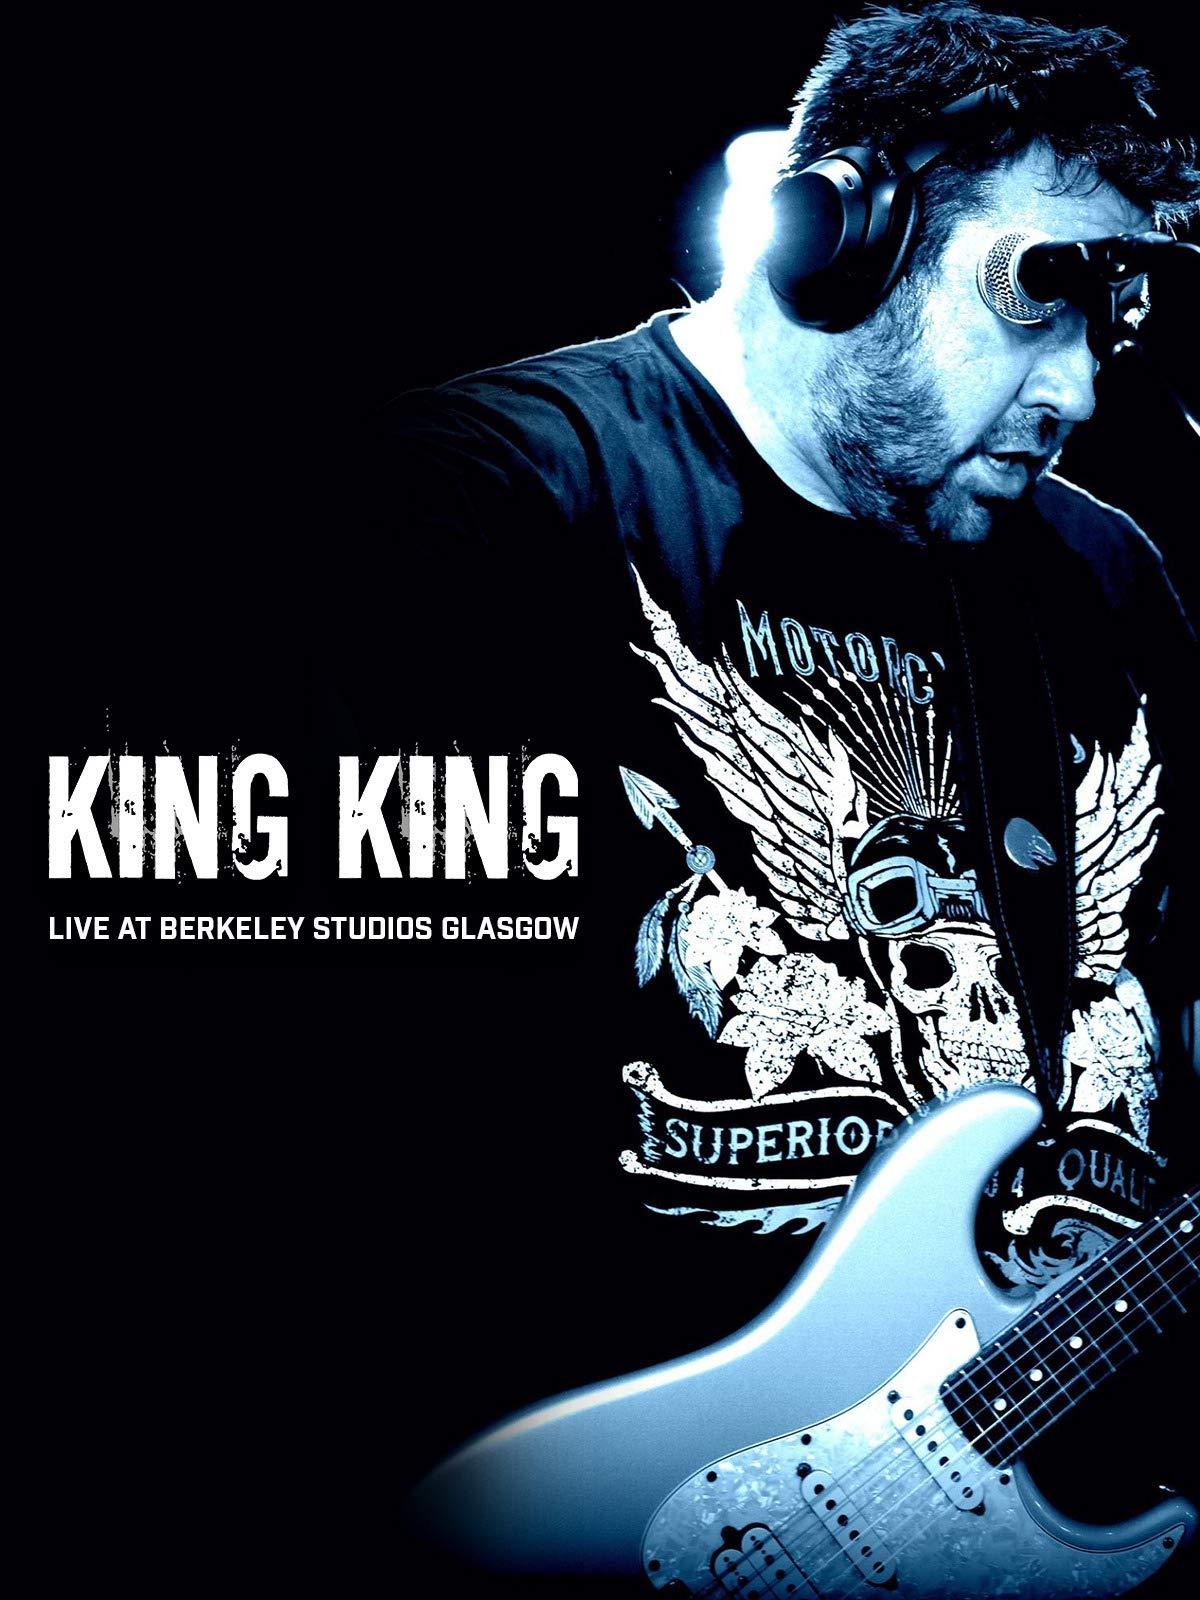 King King Live At Berkeley Studio